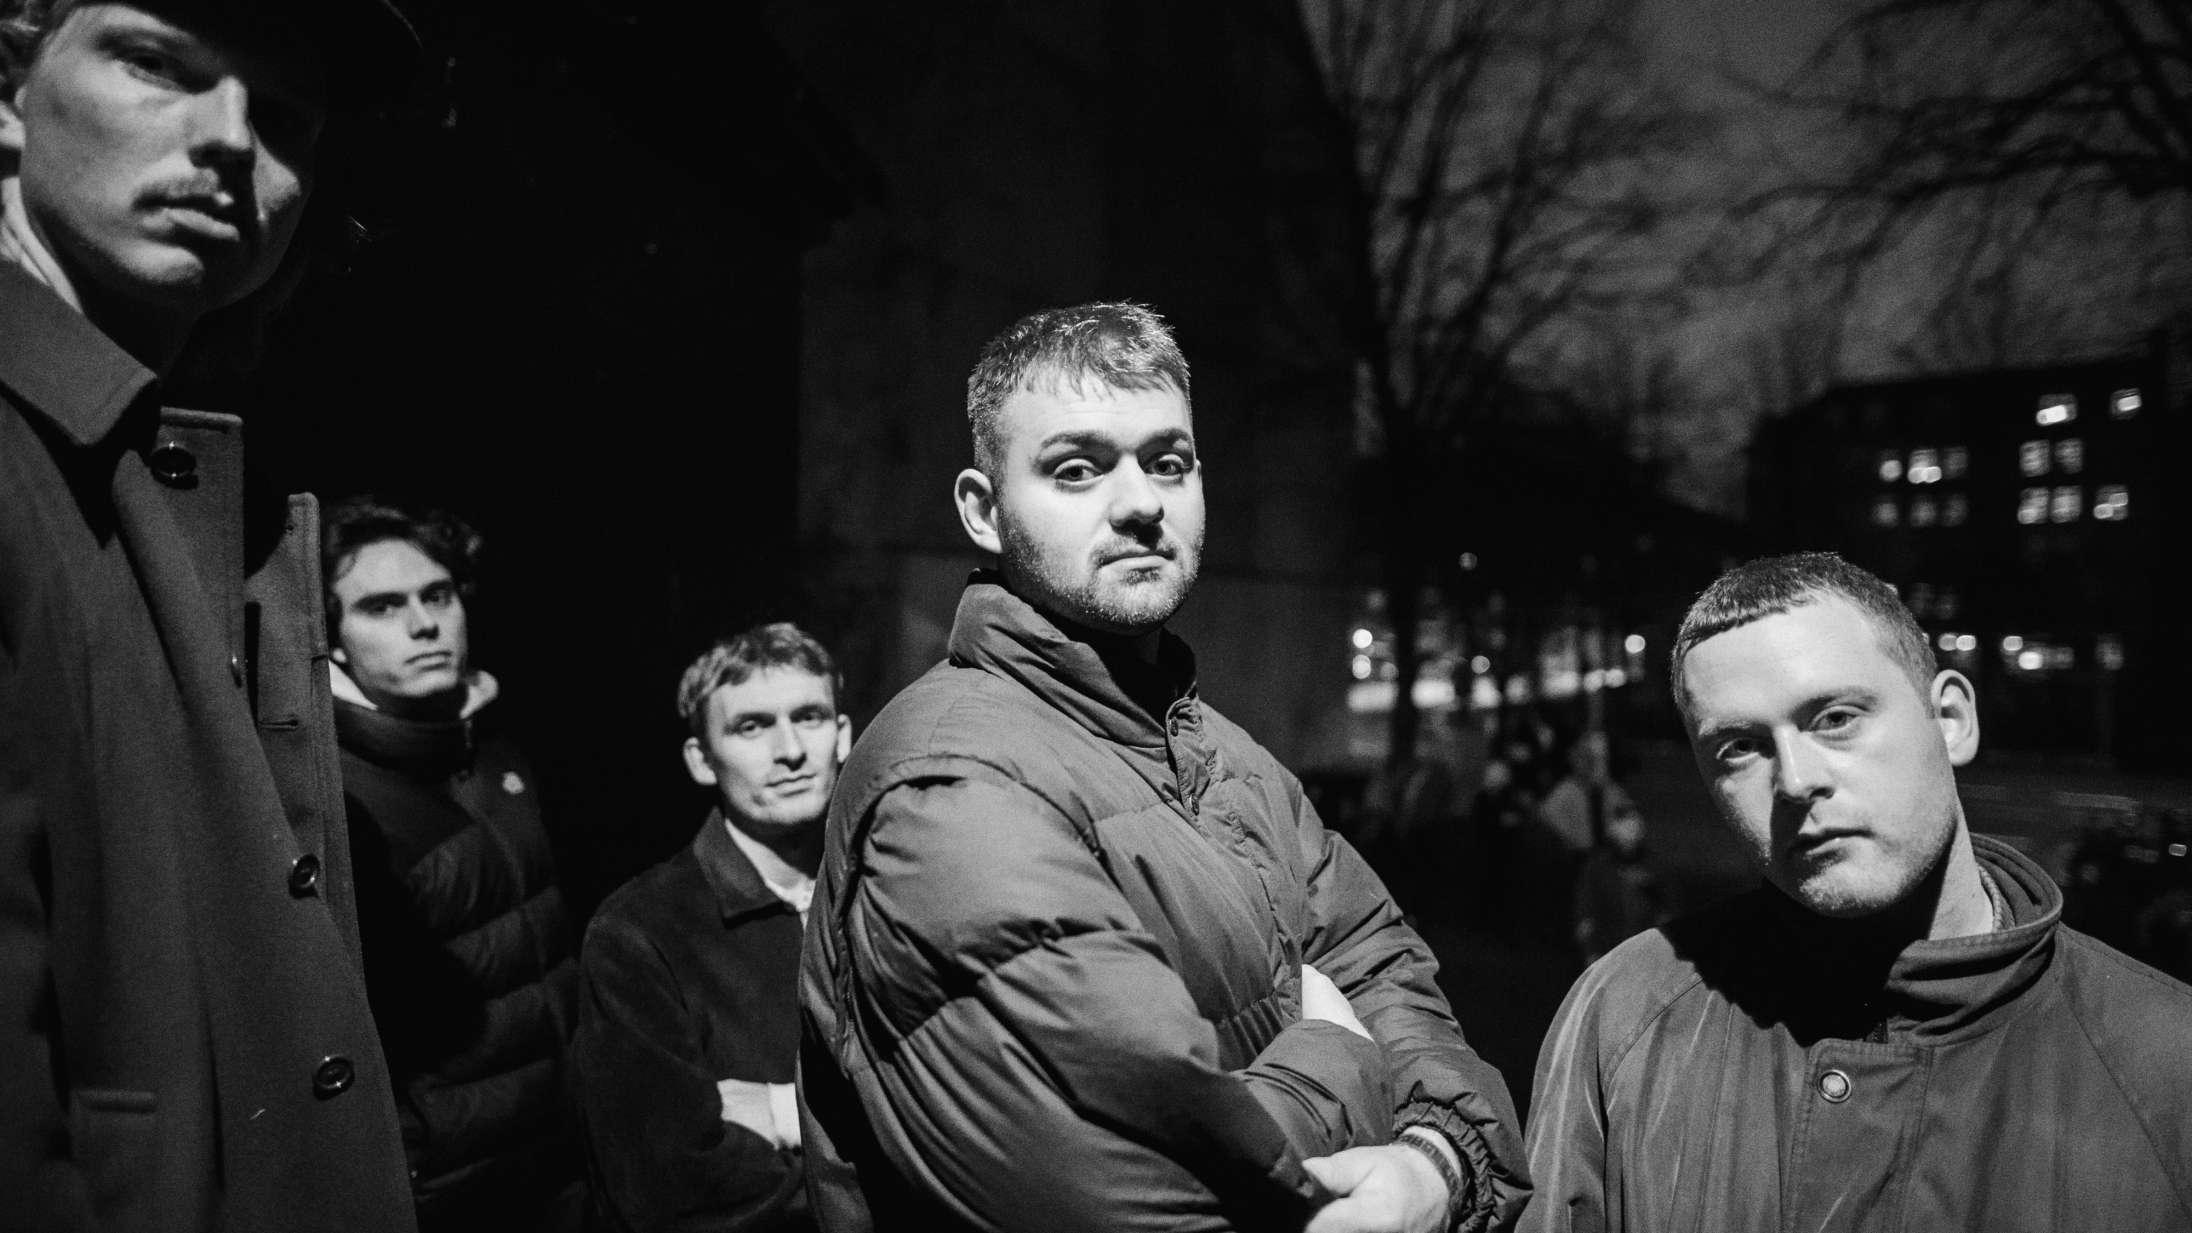 Frembrusende Joyce taler med 'Djævlen' på eksplosiv andensingle